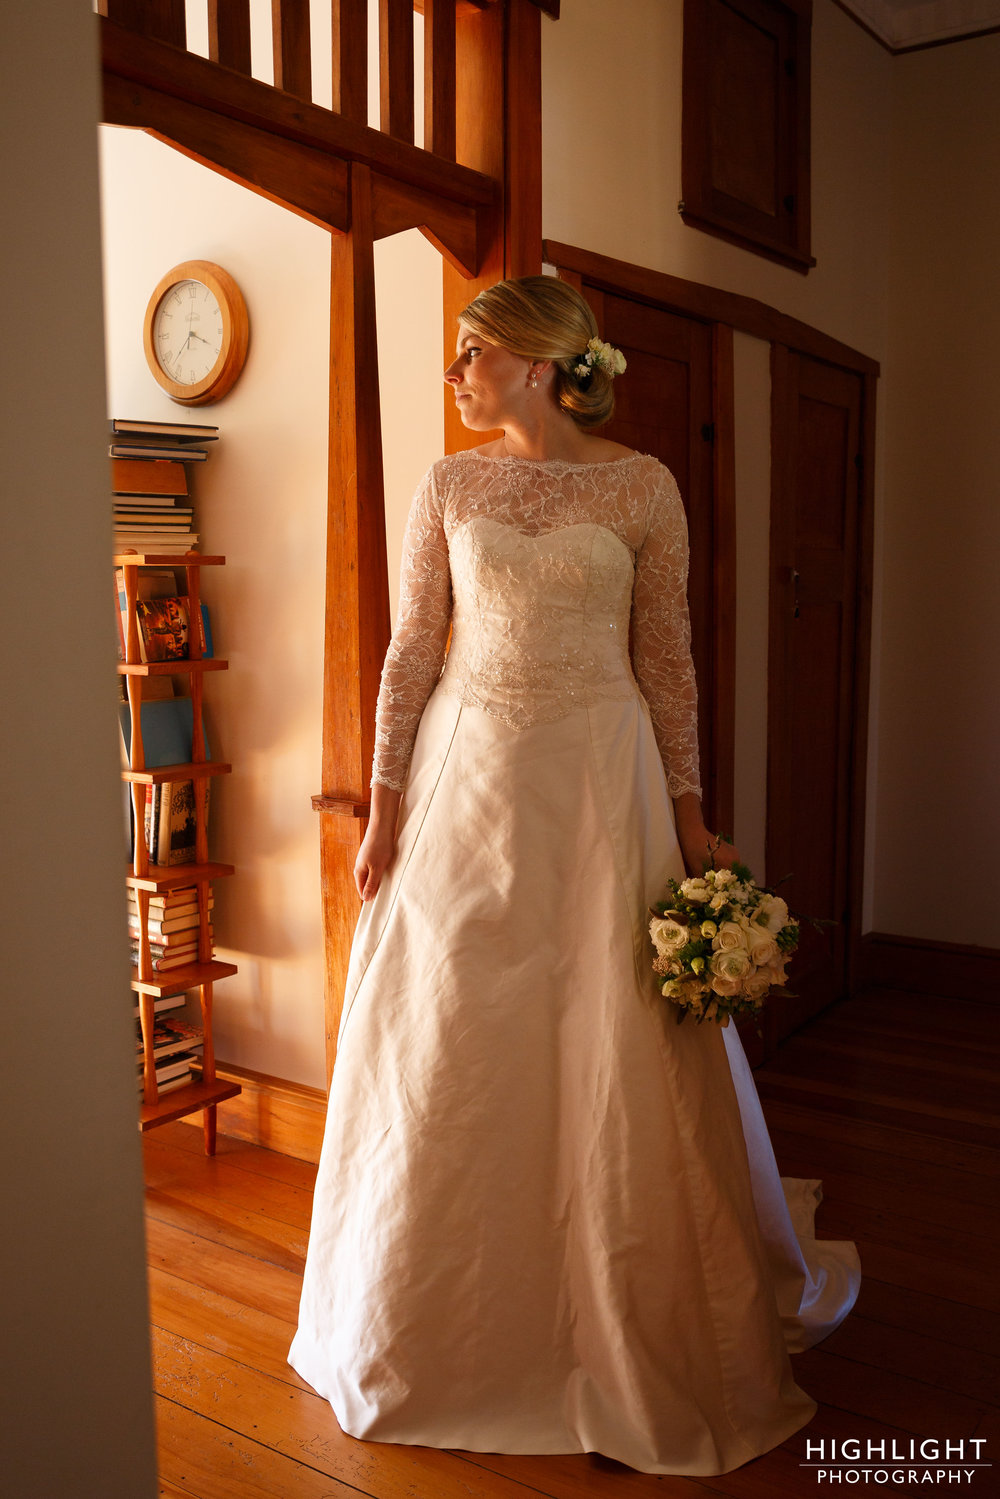 makoura-wedding-photography-highlight-new-zealand-16.jpg